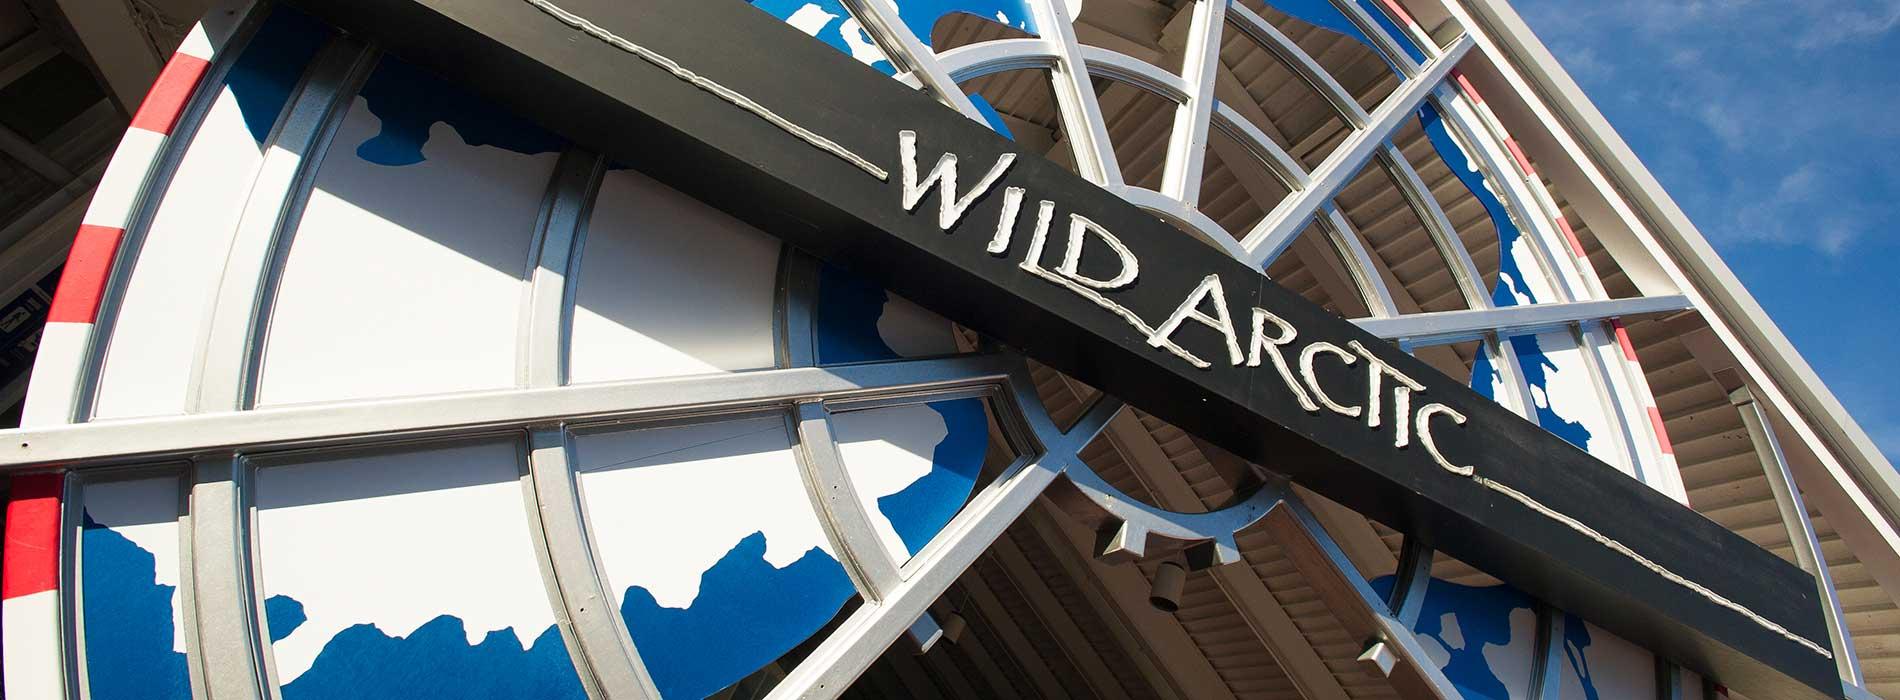 Wild Arctic Attraction at SeaWorld Orlando